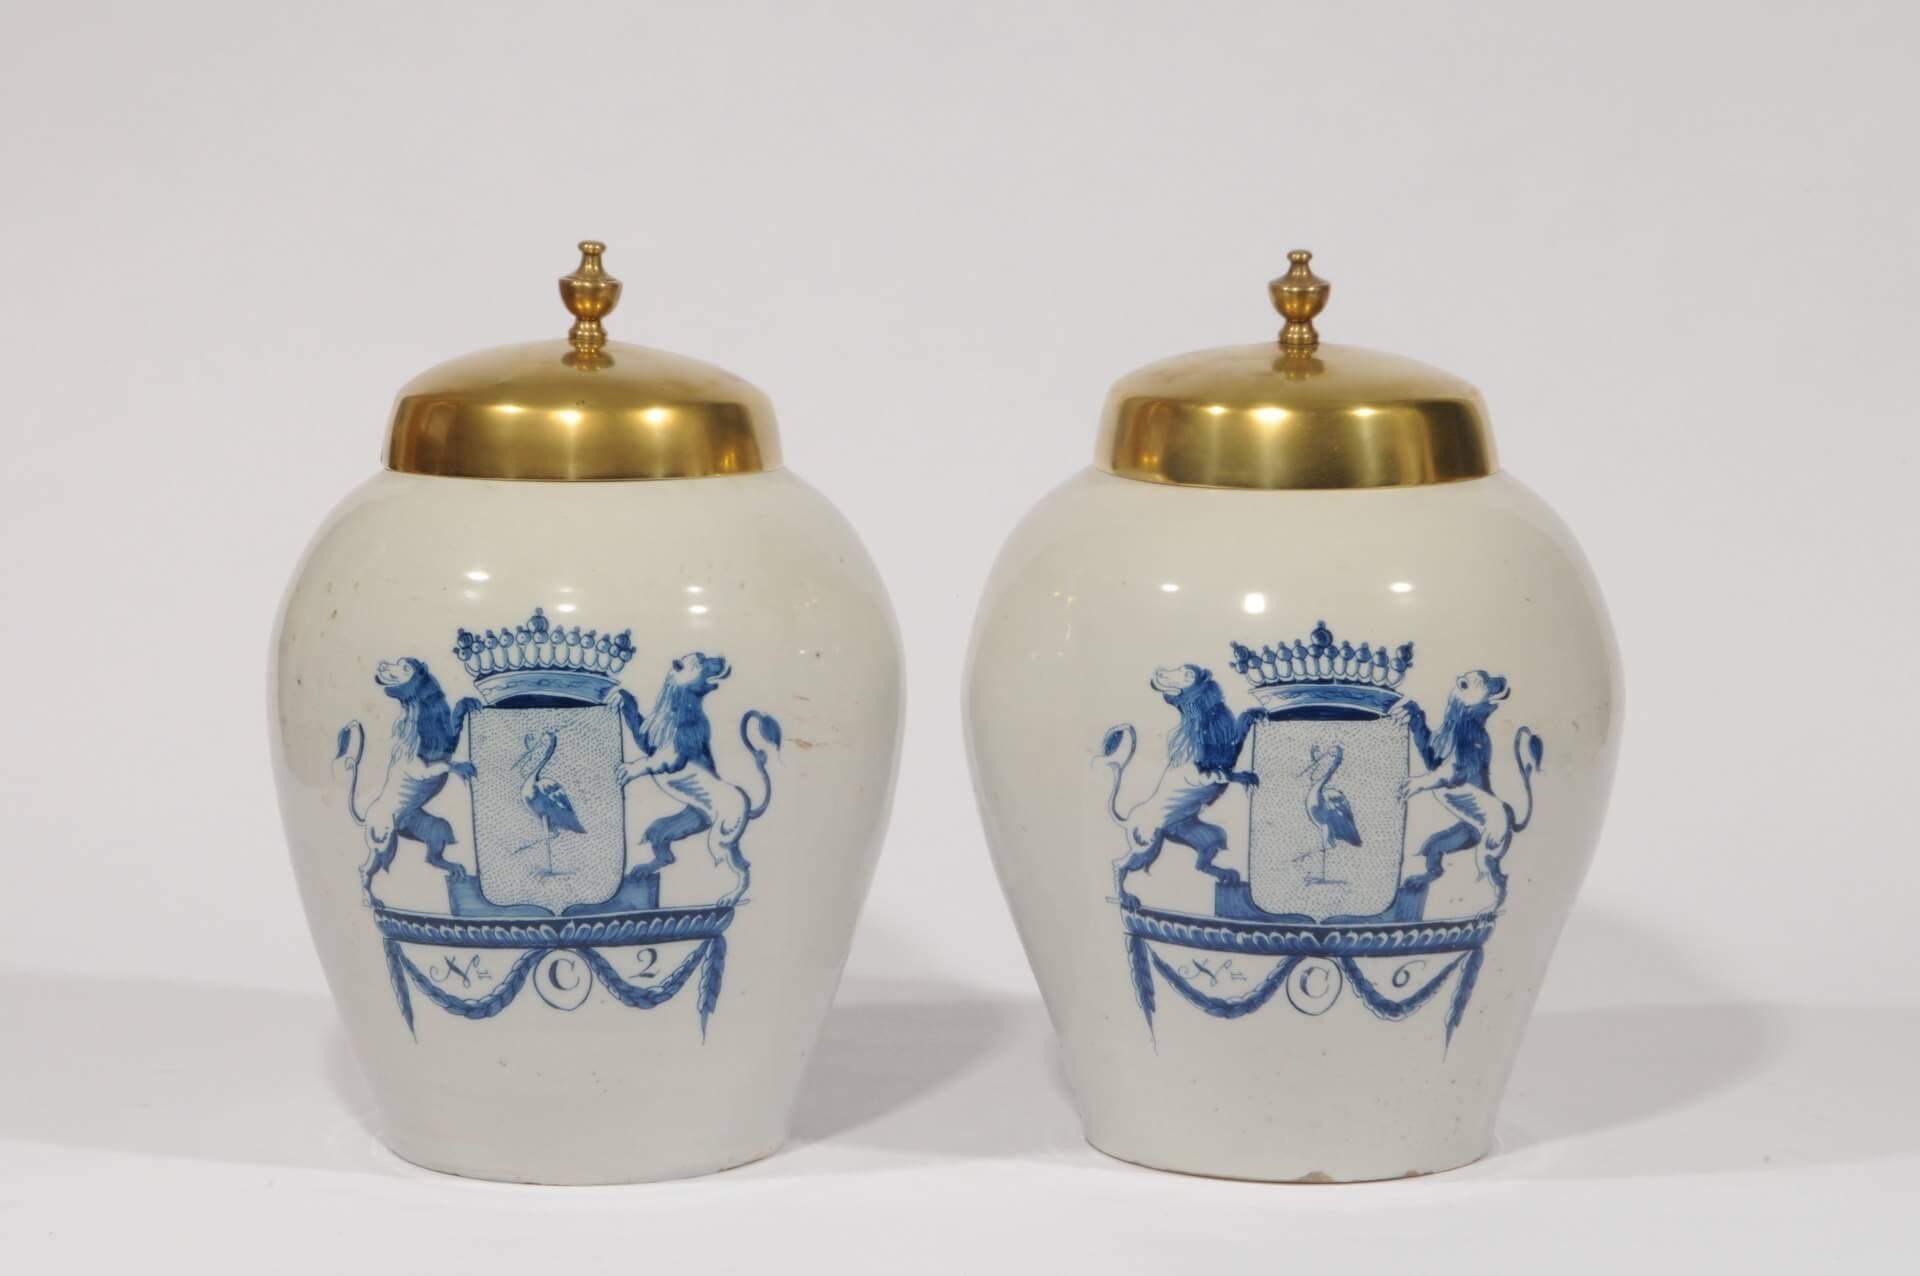 Antique dutch pottery tobacco jars Aronson Antiquairs